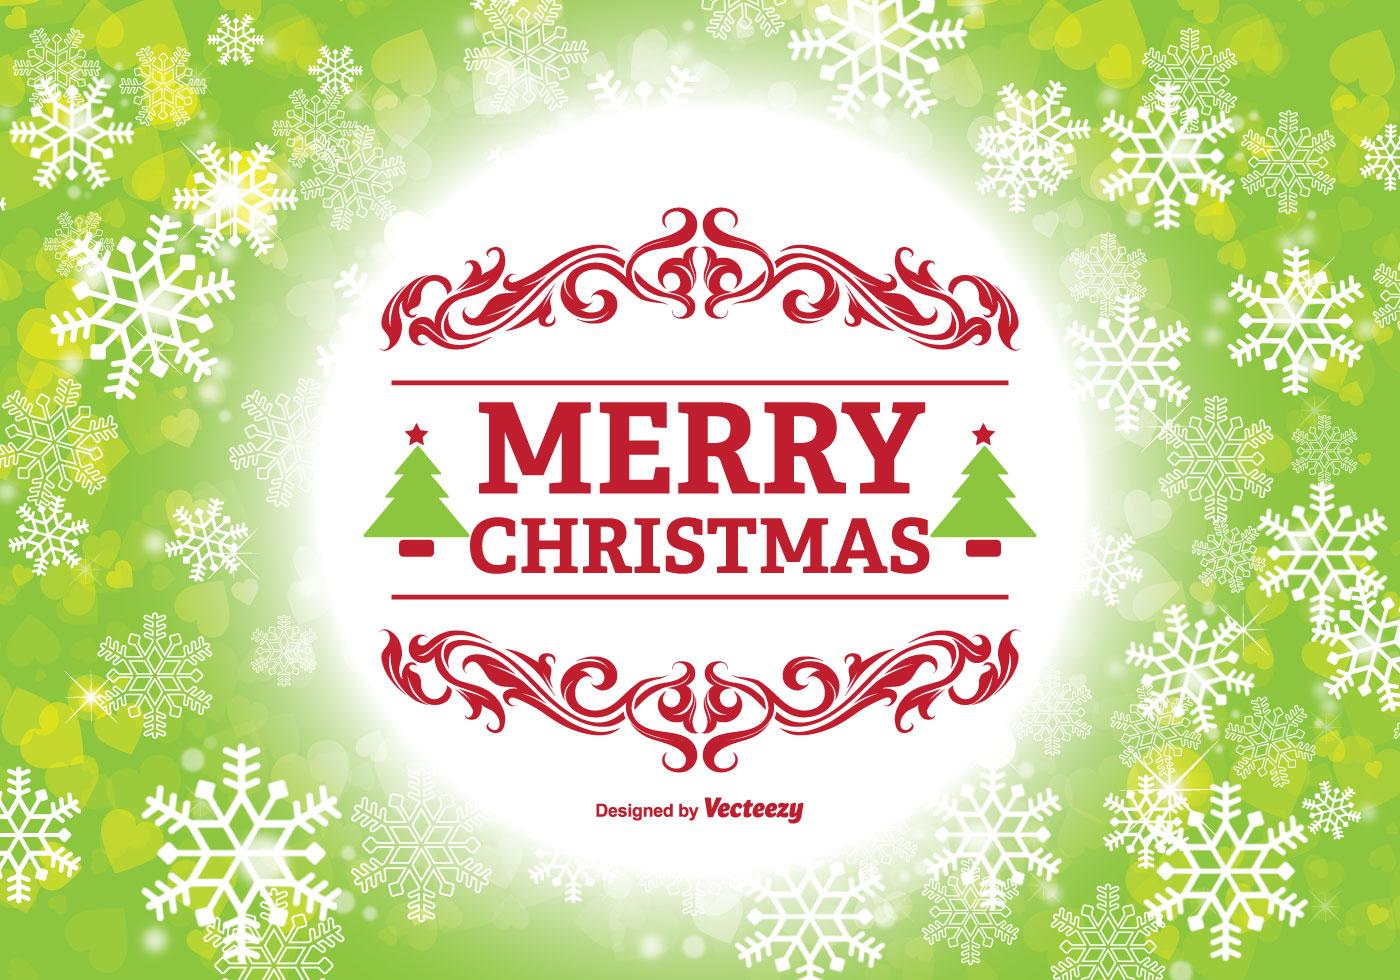 Merry Christmas Illustration Download Free Vector Art